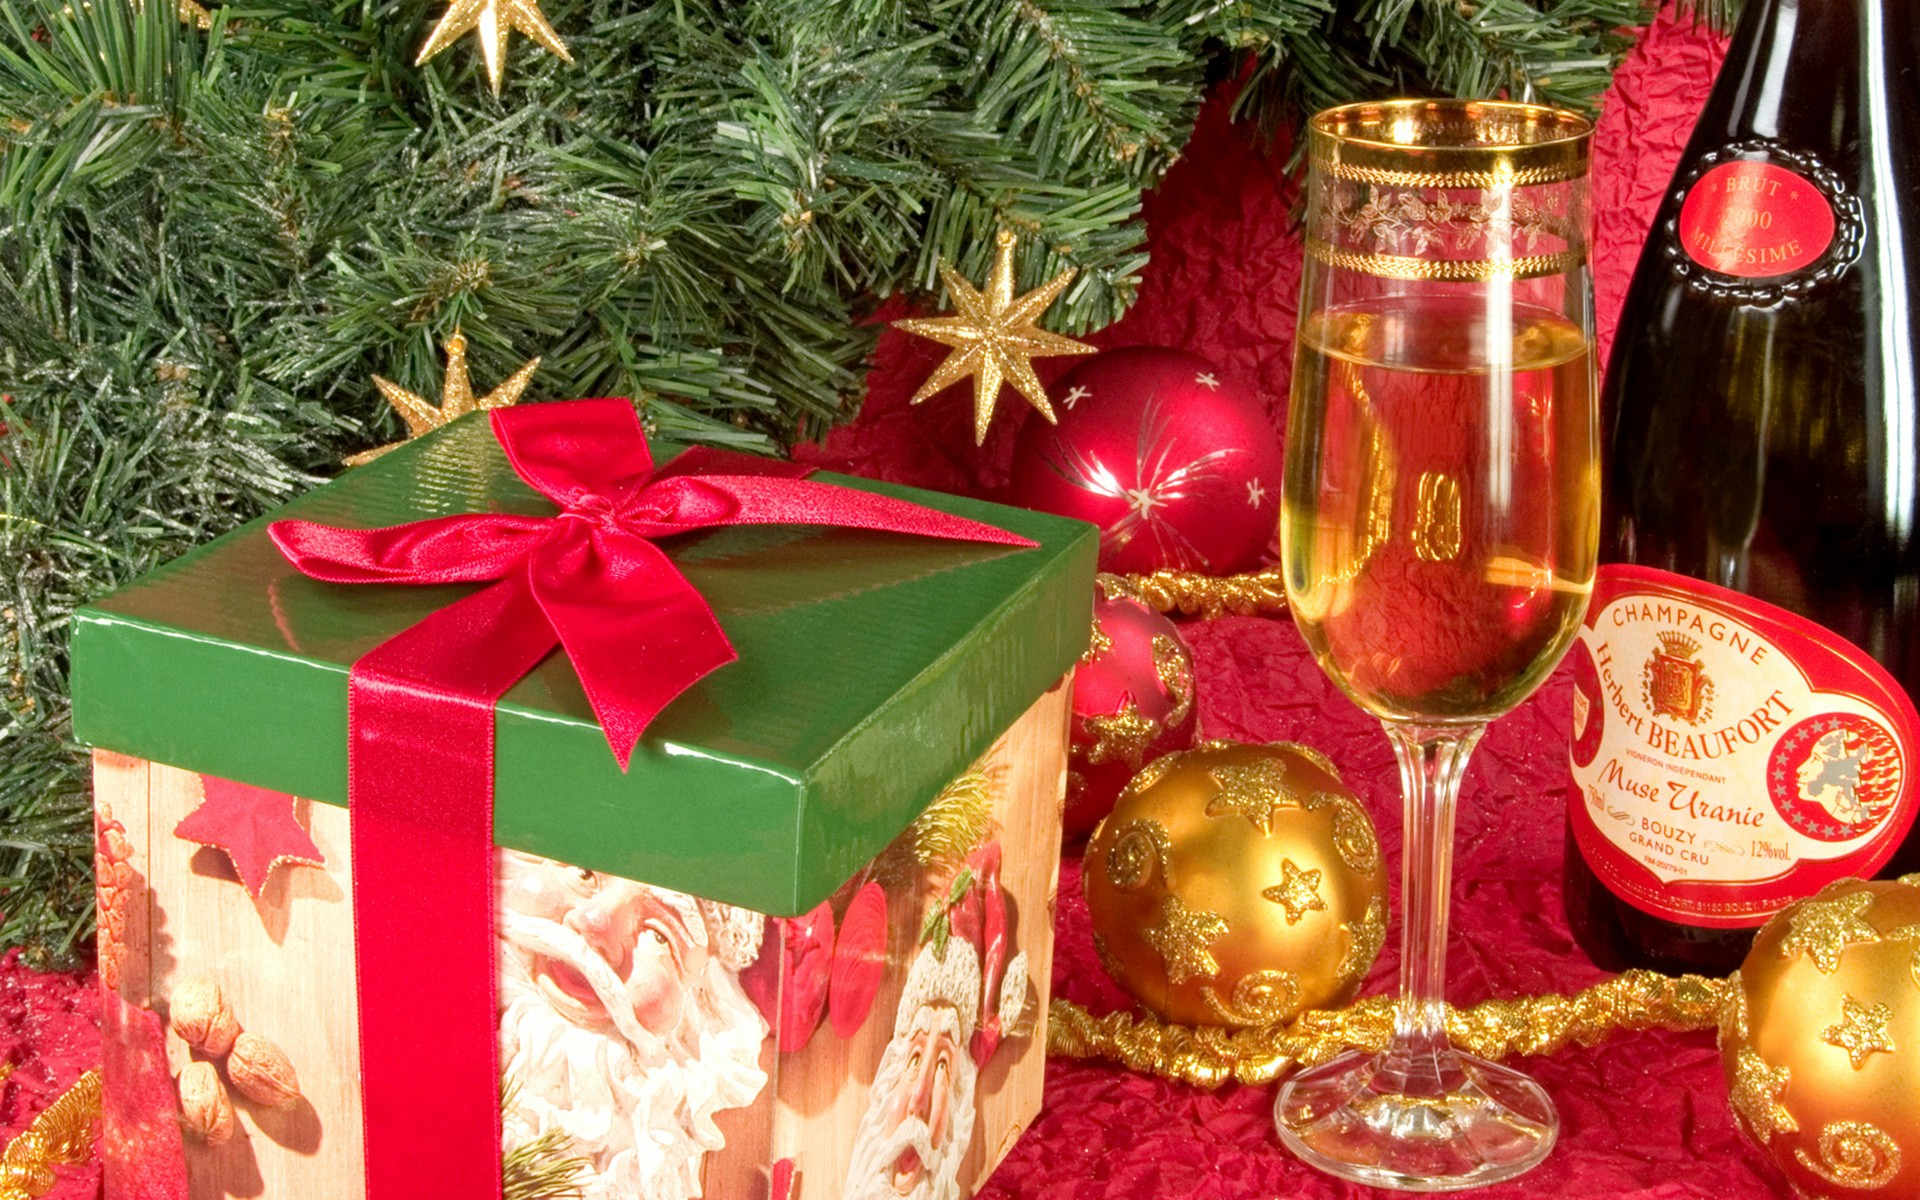 Champagne por navidad - 1920x1200